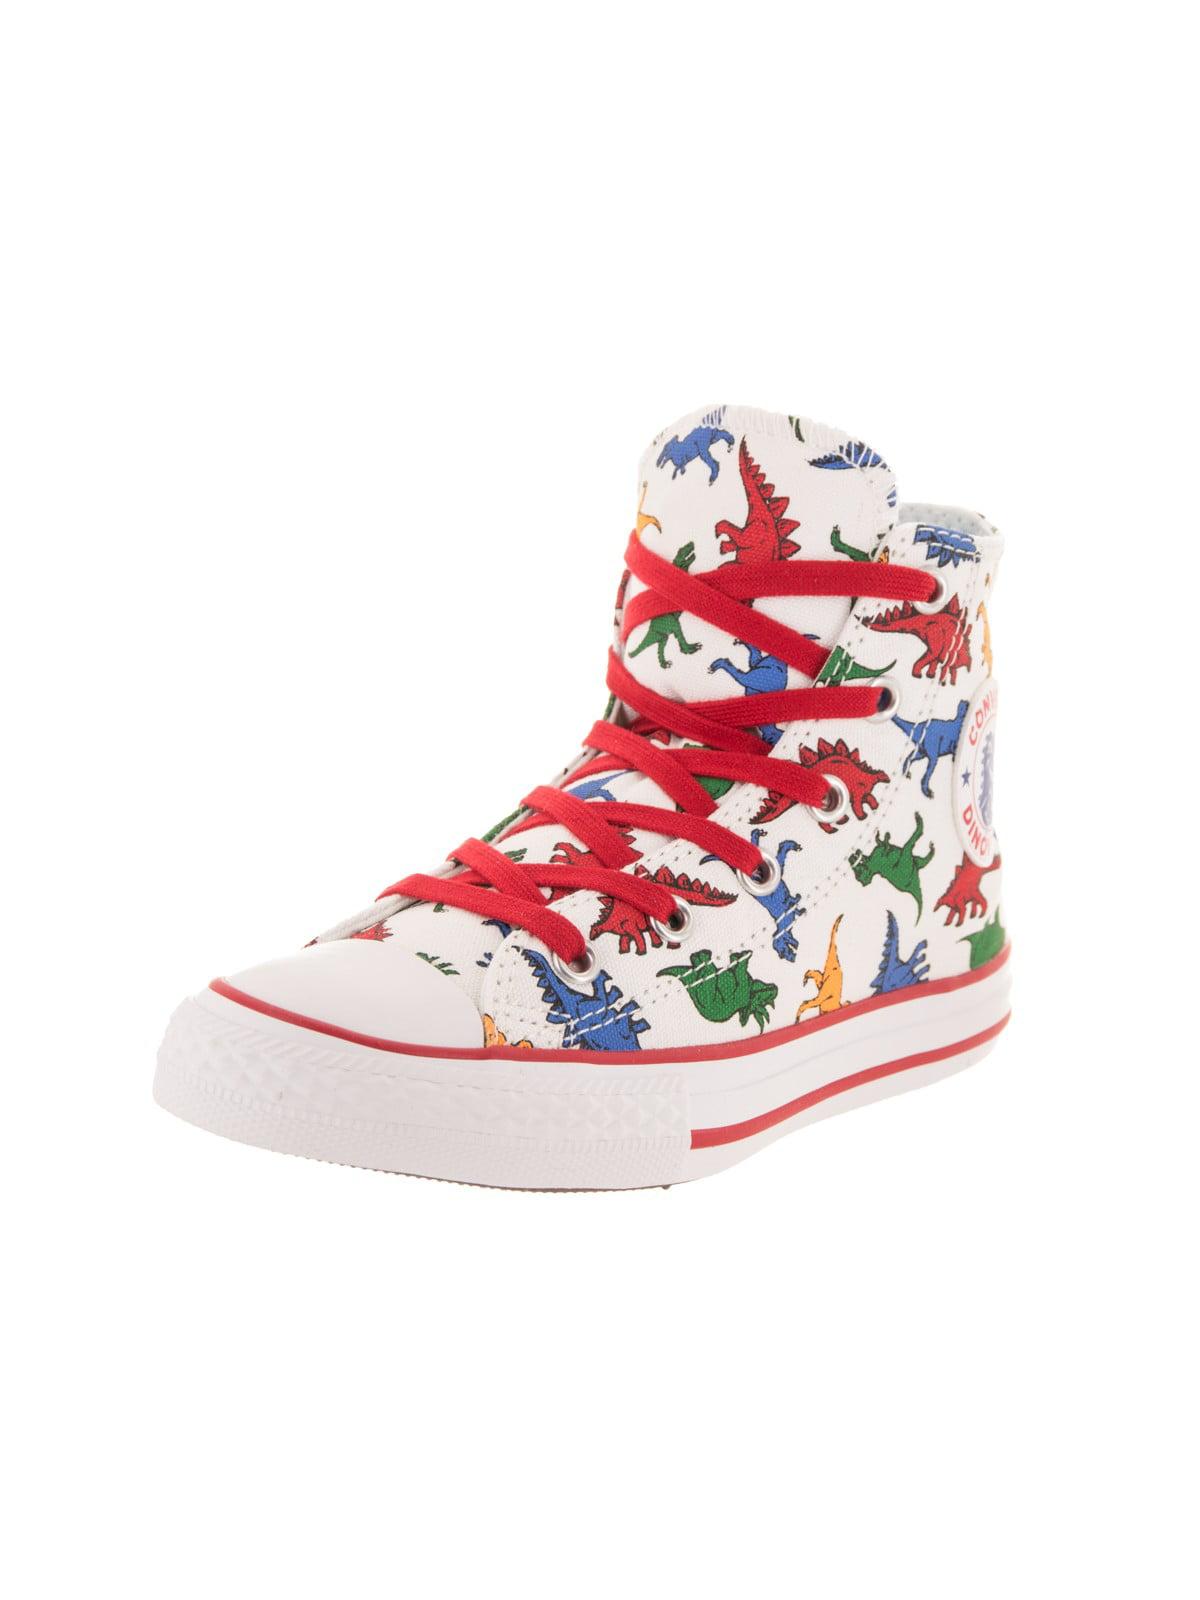 47f3a4e7304c Converse Kids Chuck Taylor All Star Hi Casual Shoe